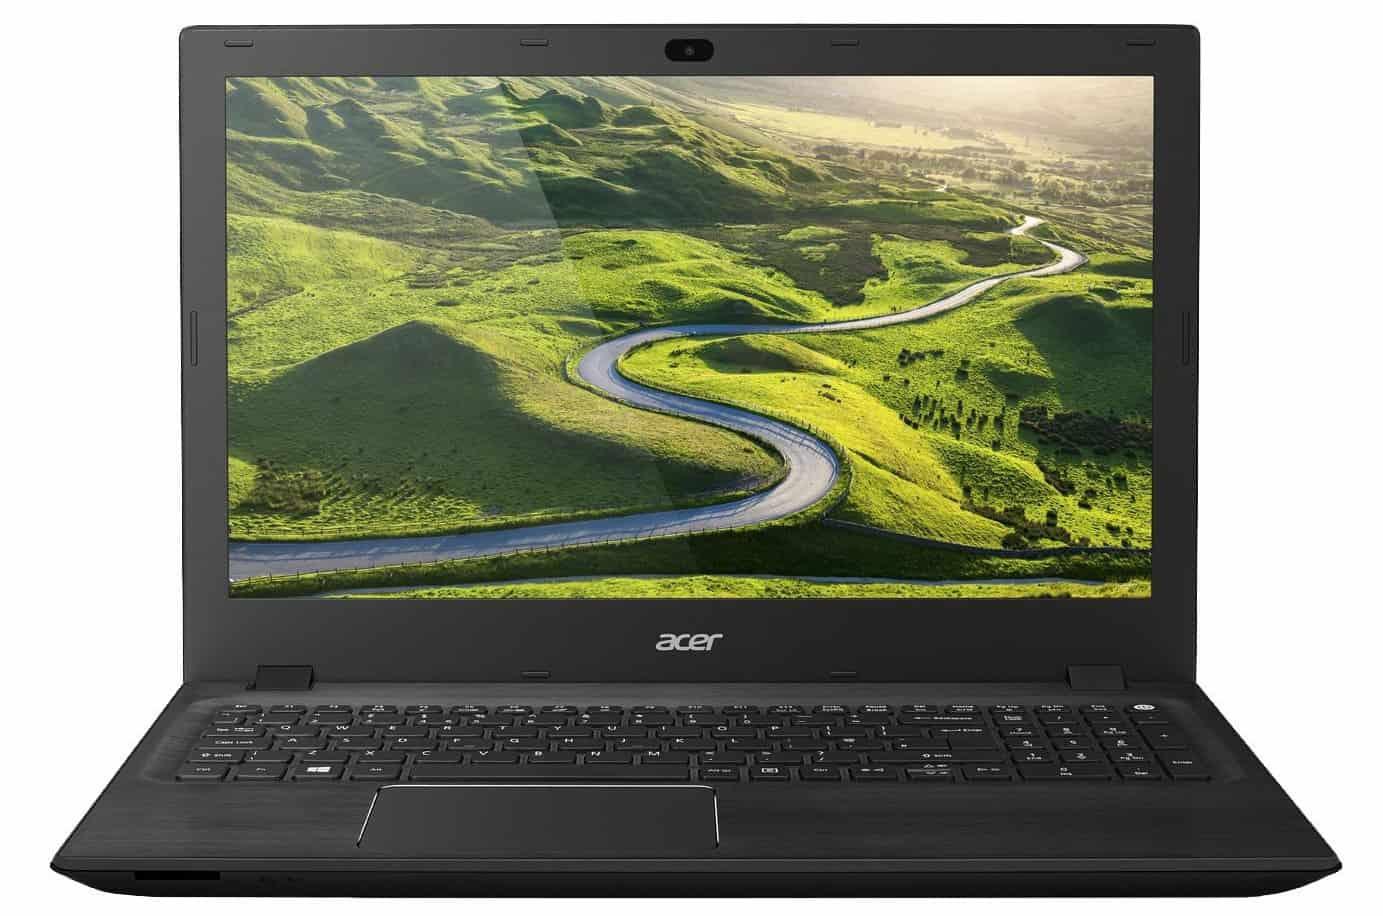 Acer Aspire F5-572G-55Q9